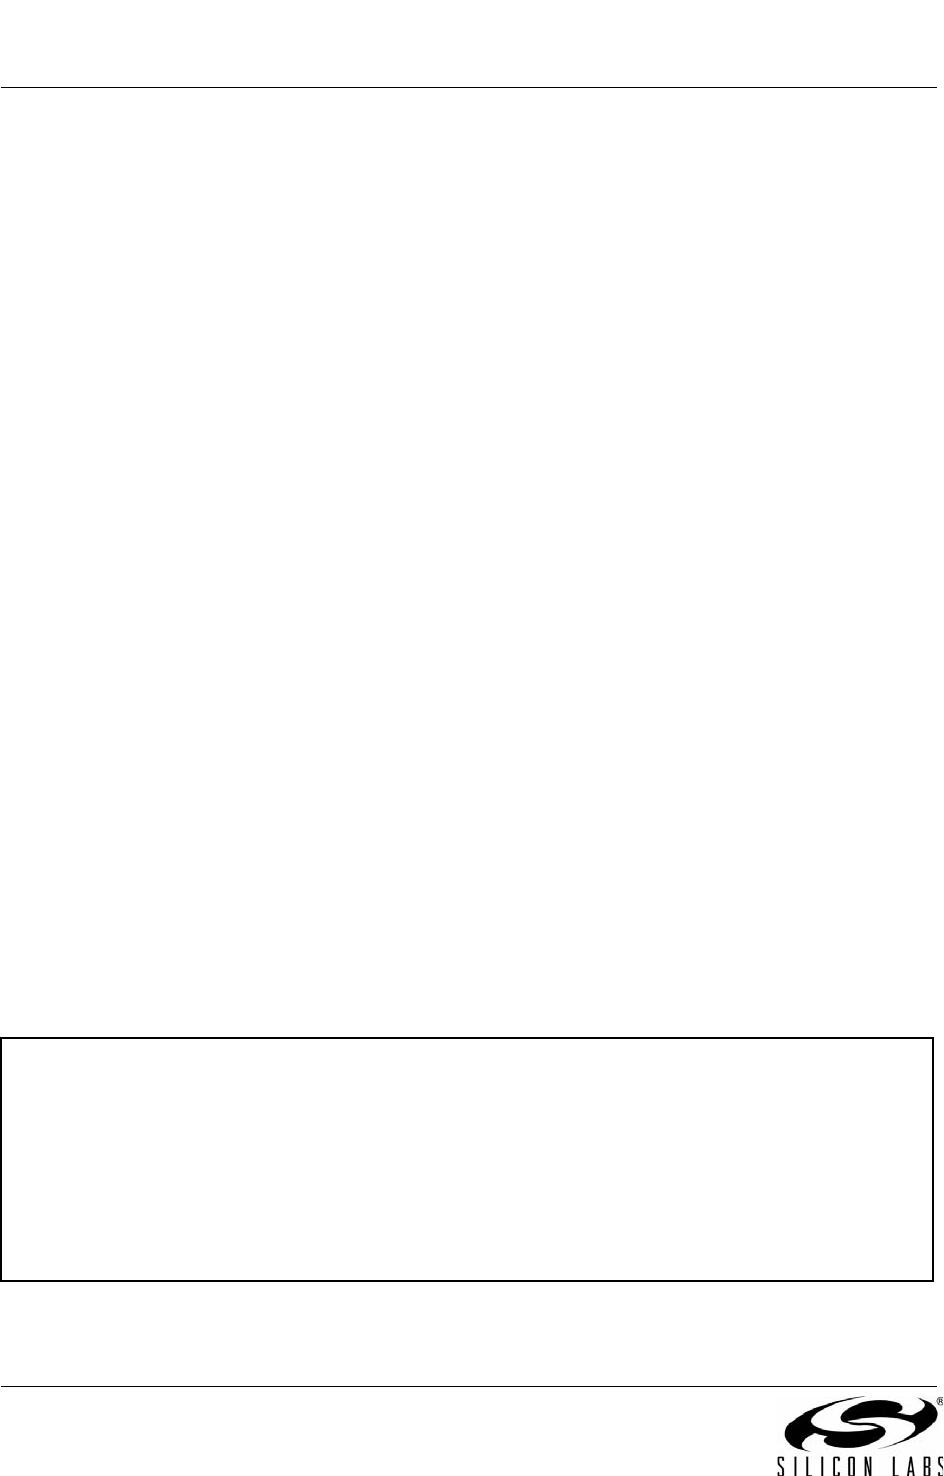 WWW_TX538_COM_si102x pdf下载及第538页内容在线浏览